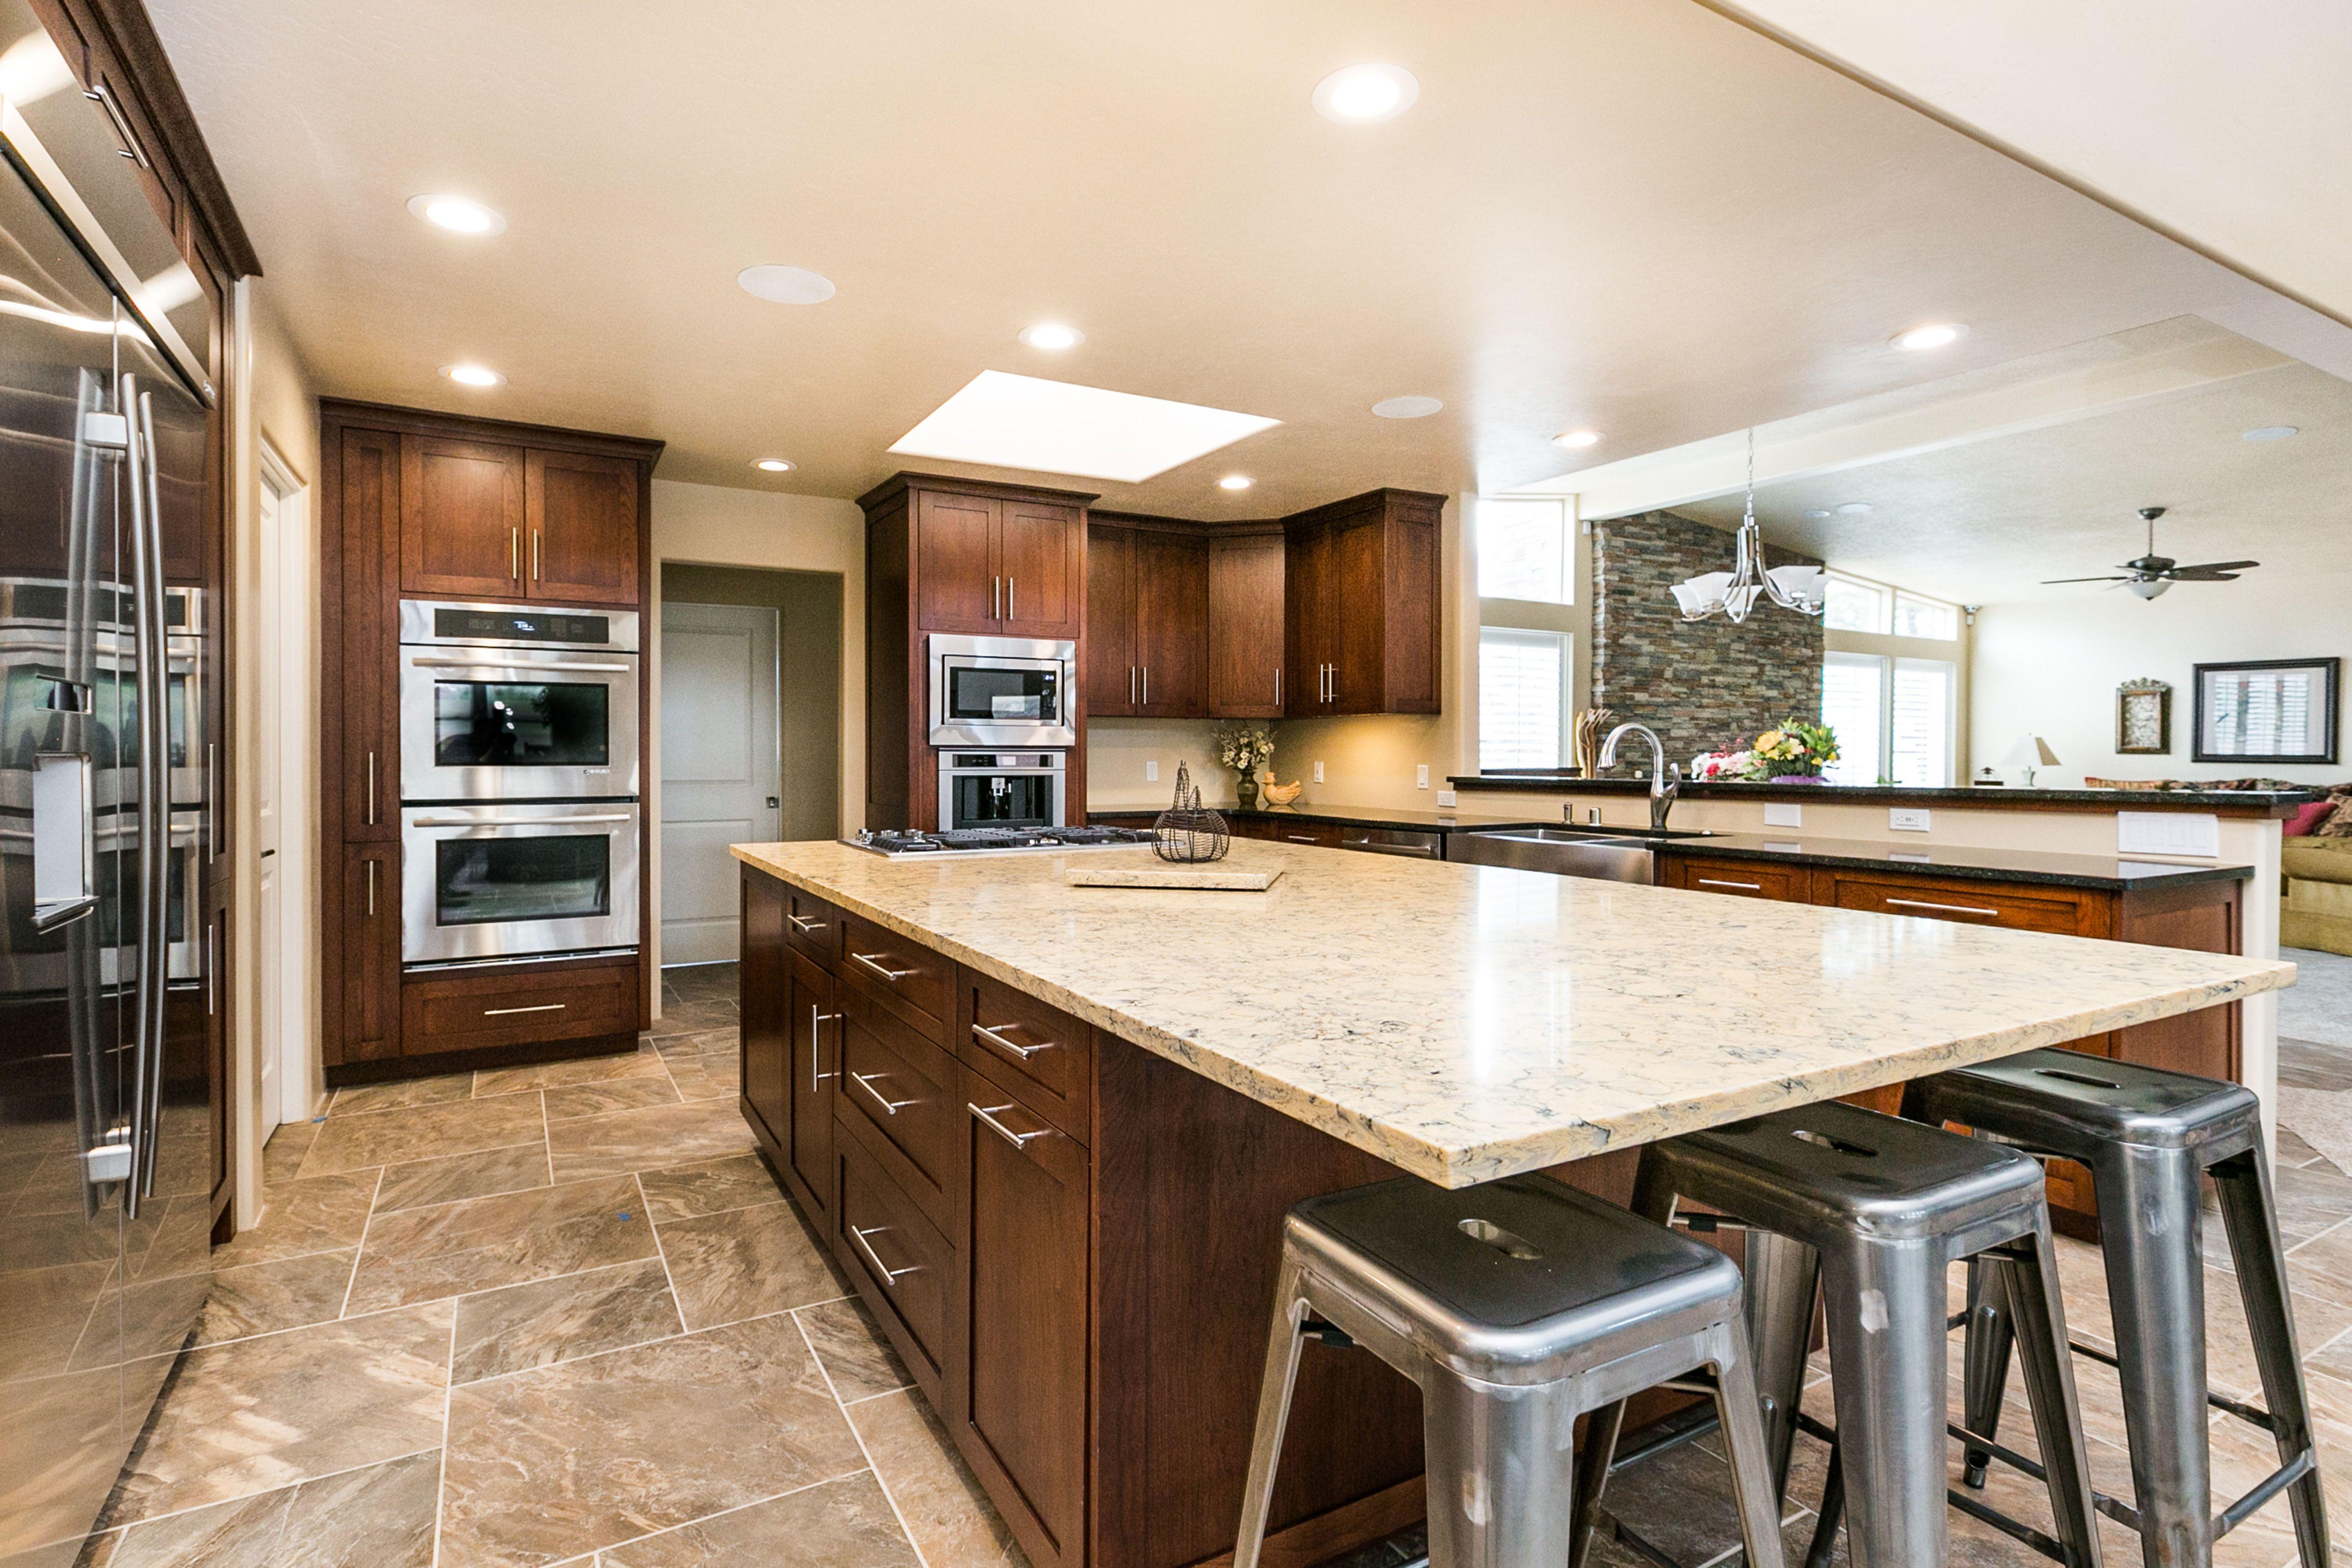 Hernandez Residence Albuquerque Kitchen Remodel Design Alliance Inc Countertop Design Kitchen Remodel Design Kitchen Remodel